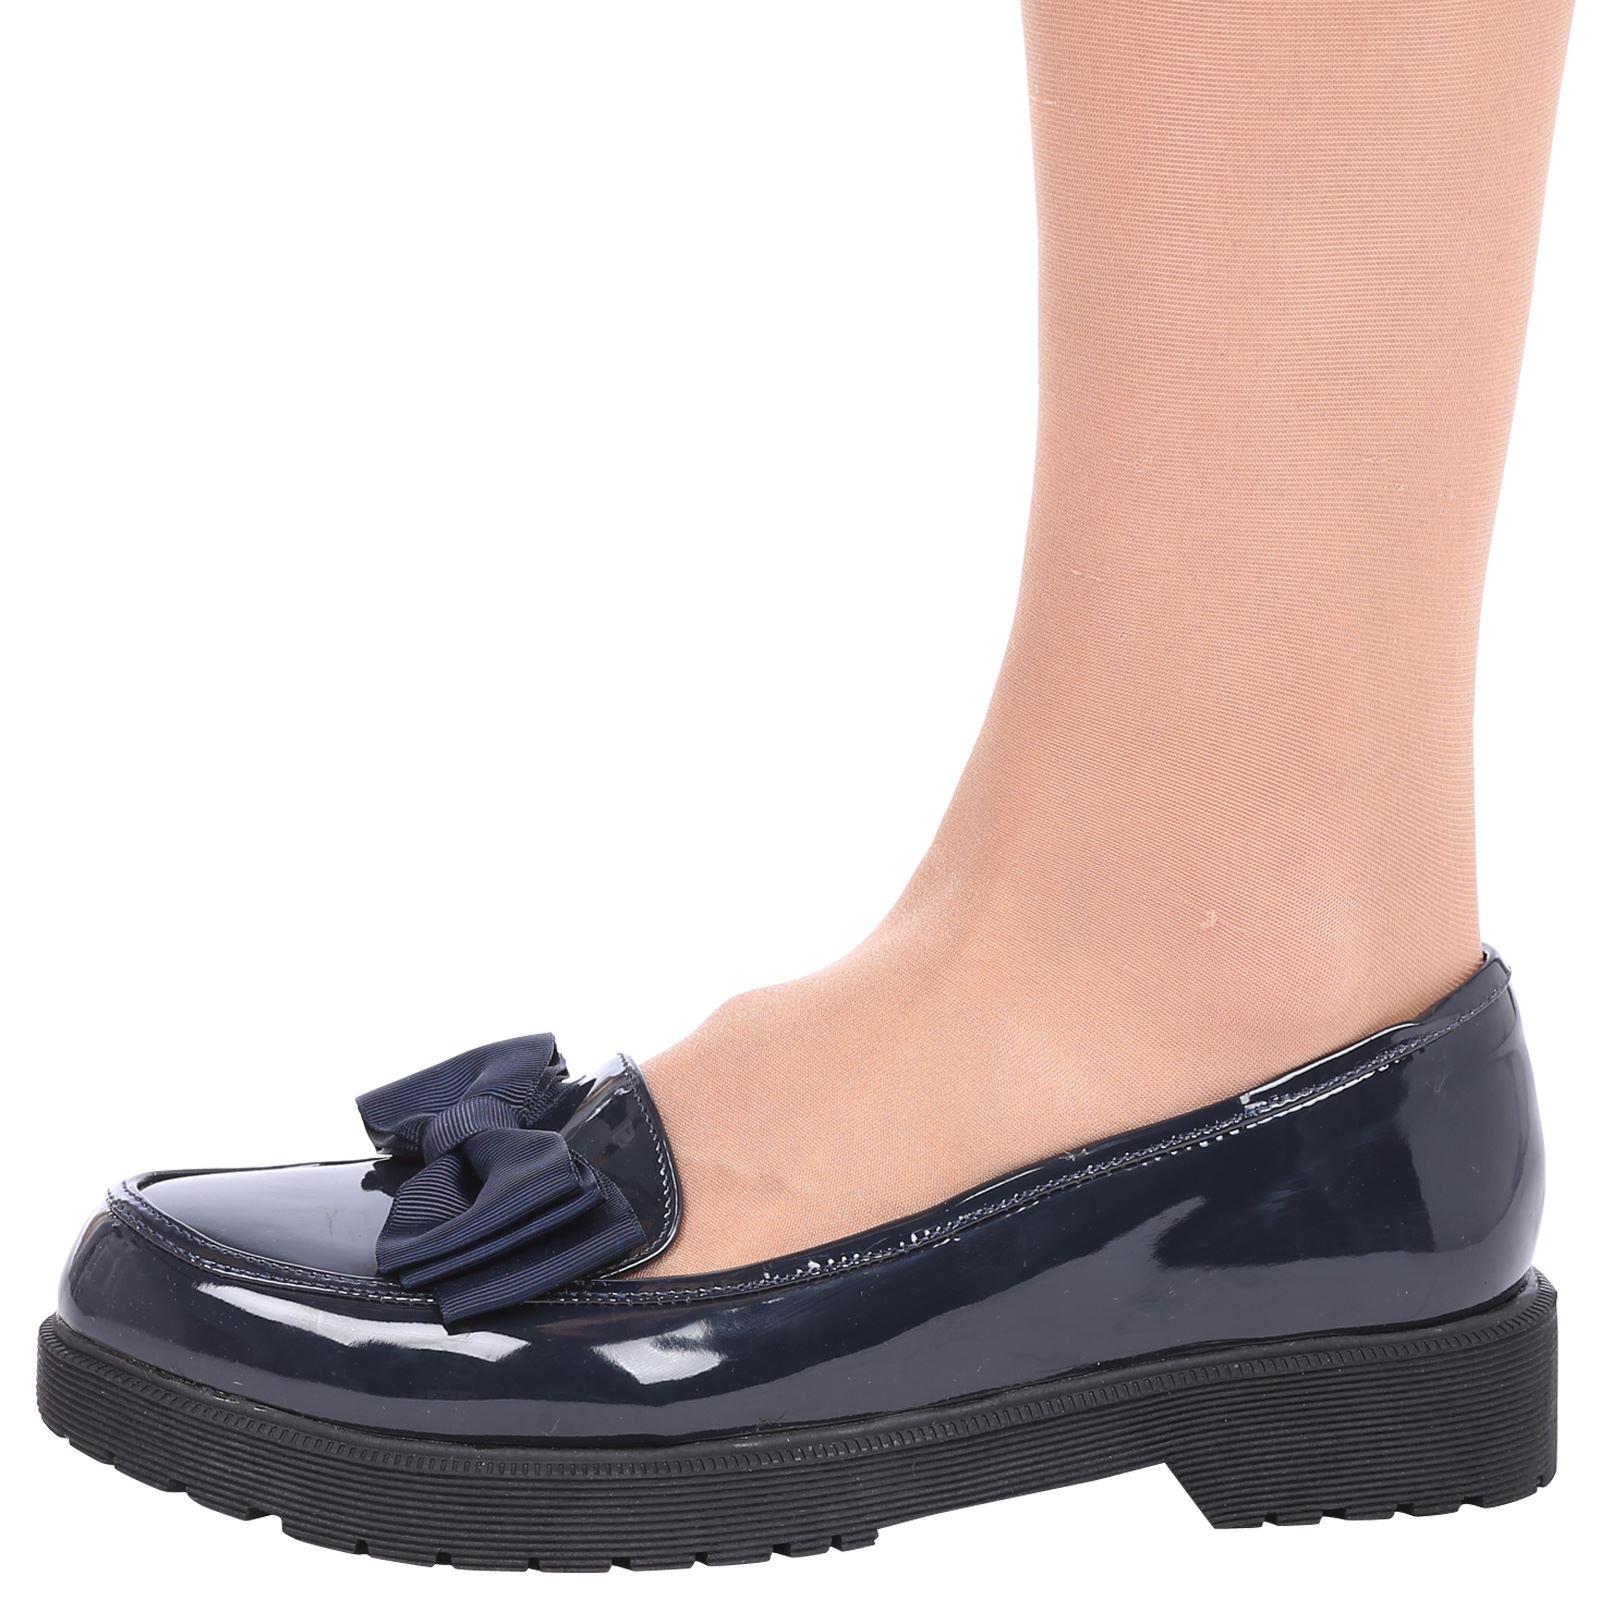 Kids School Loafer Shoes